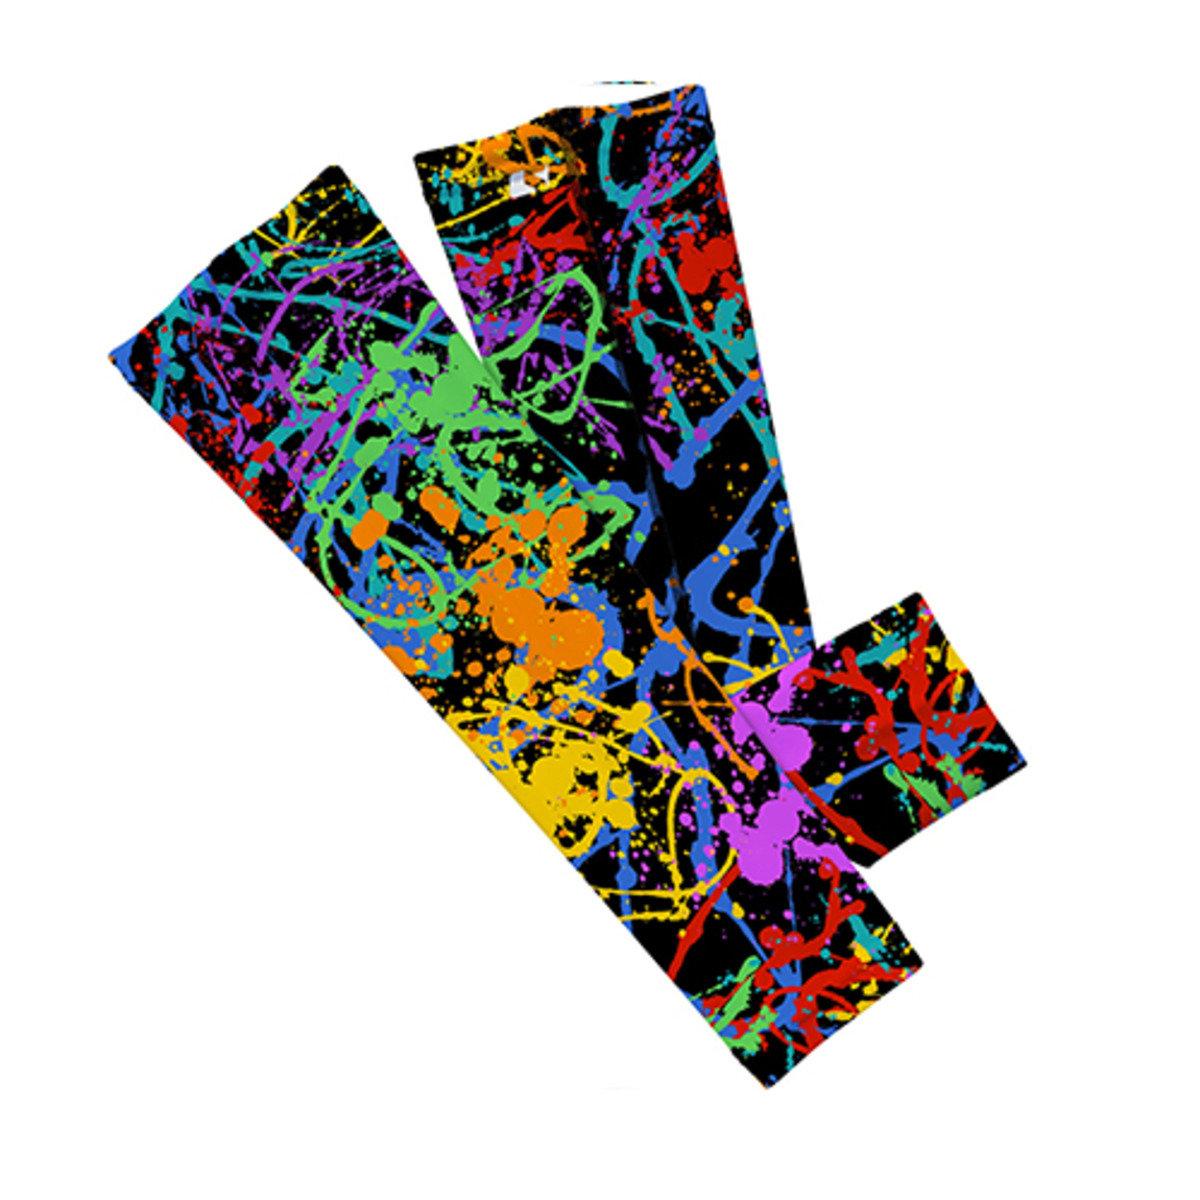 Splash Arm - 抗UV 手袖